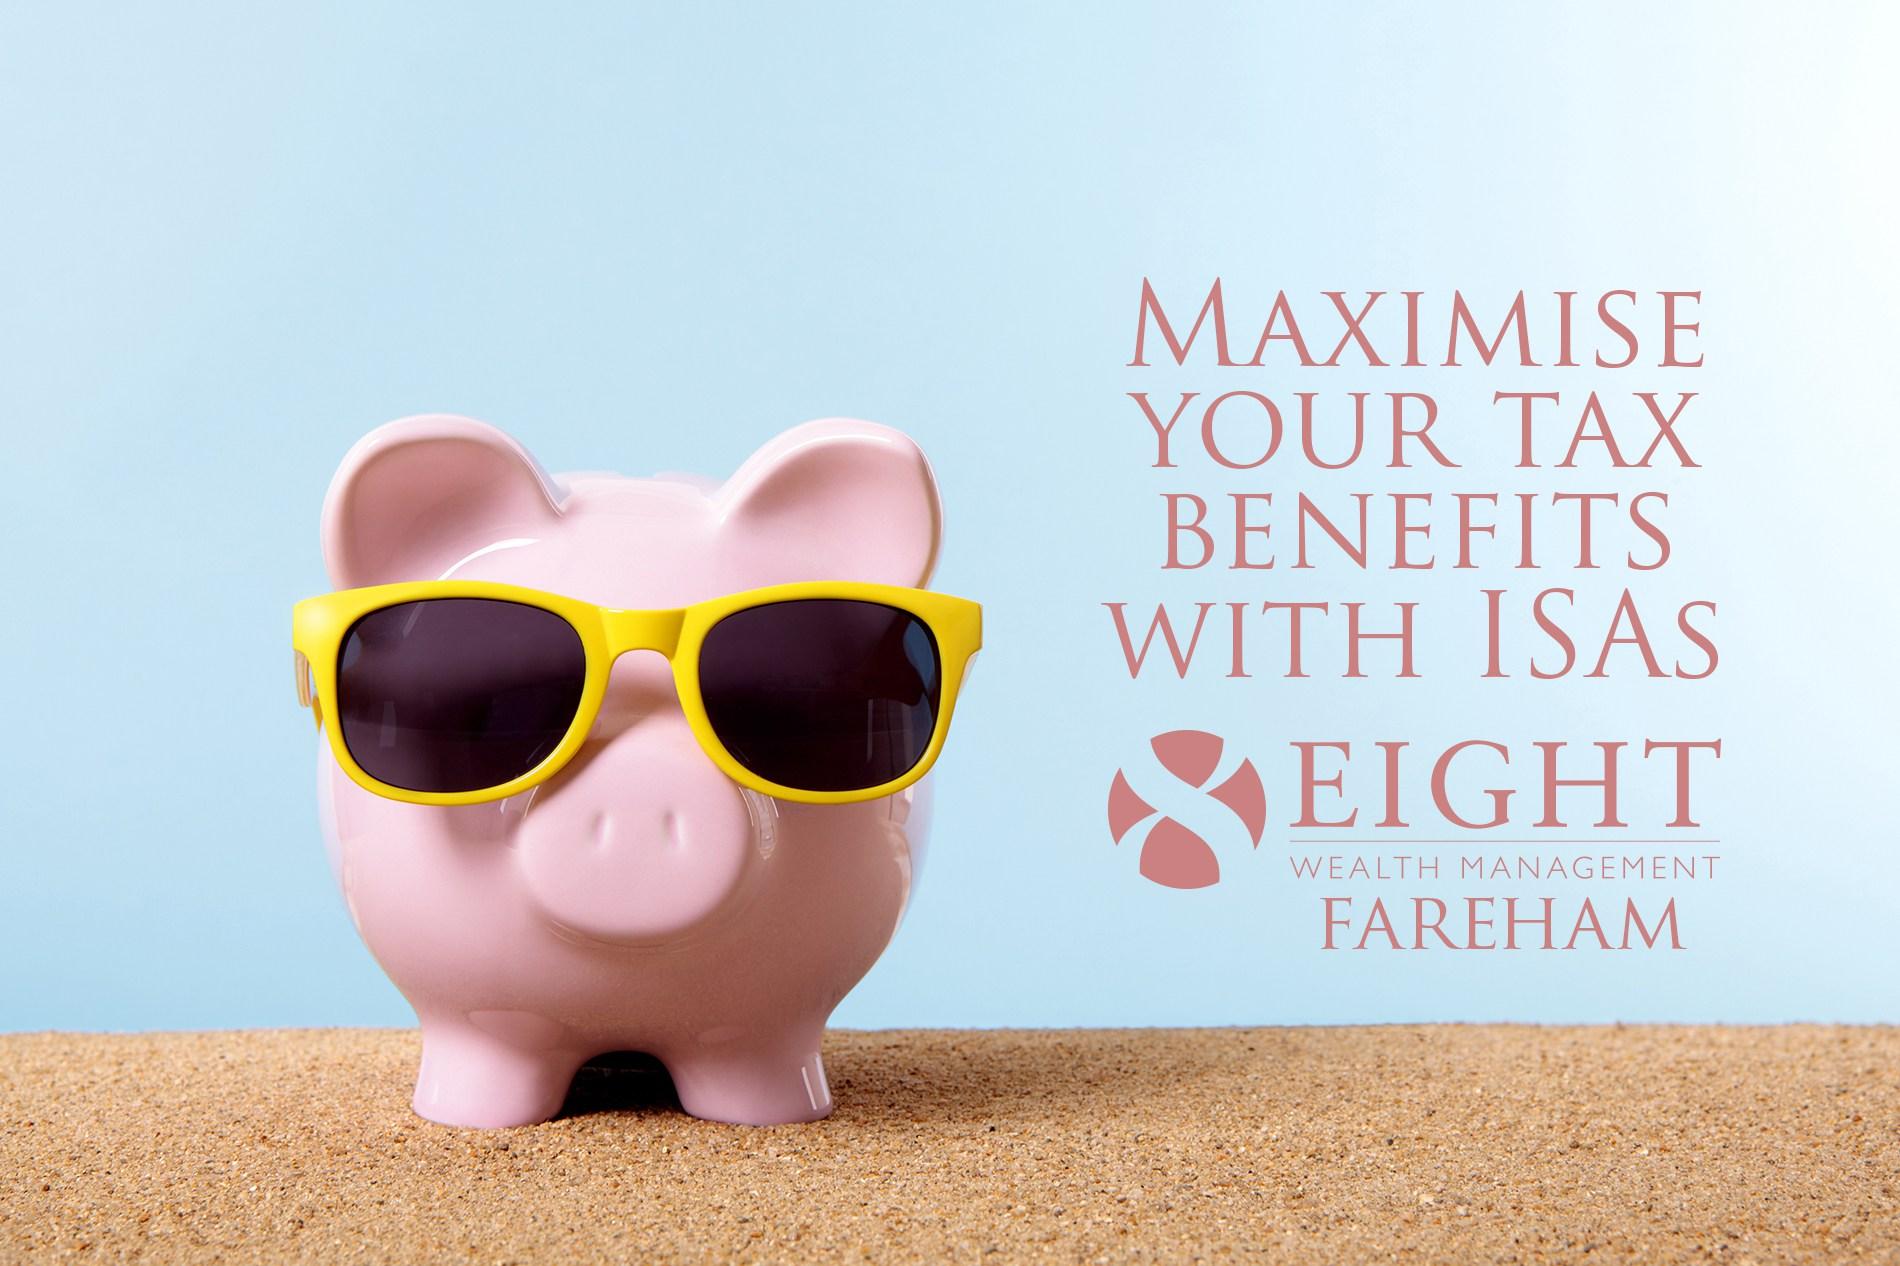 Fareham-financial-advisers-focus-on-maximising-tax-benefits-through-ISAs.jpg